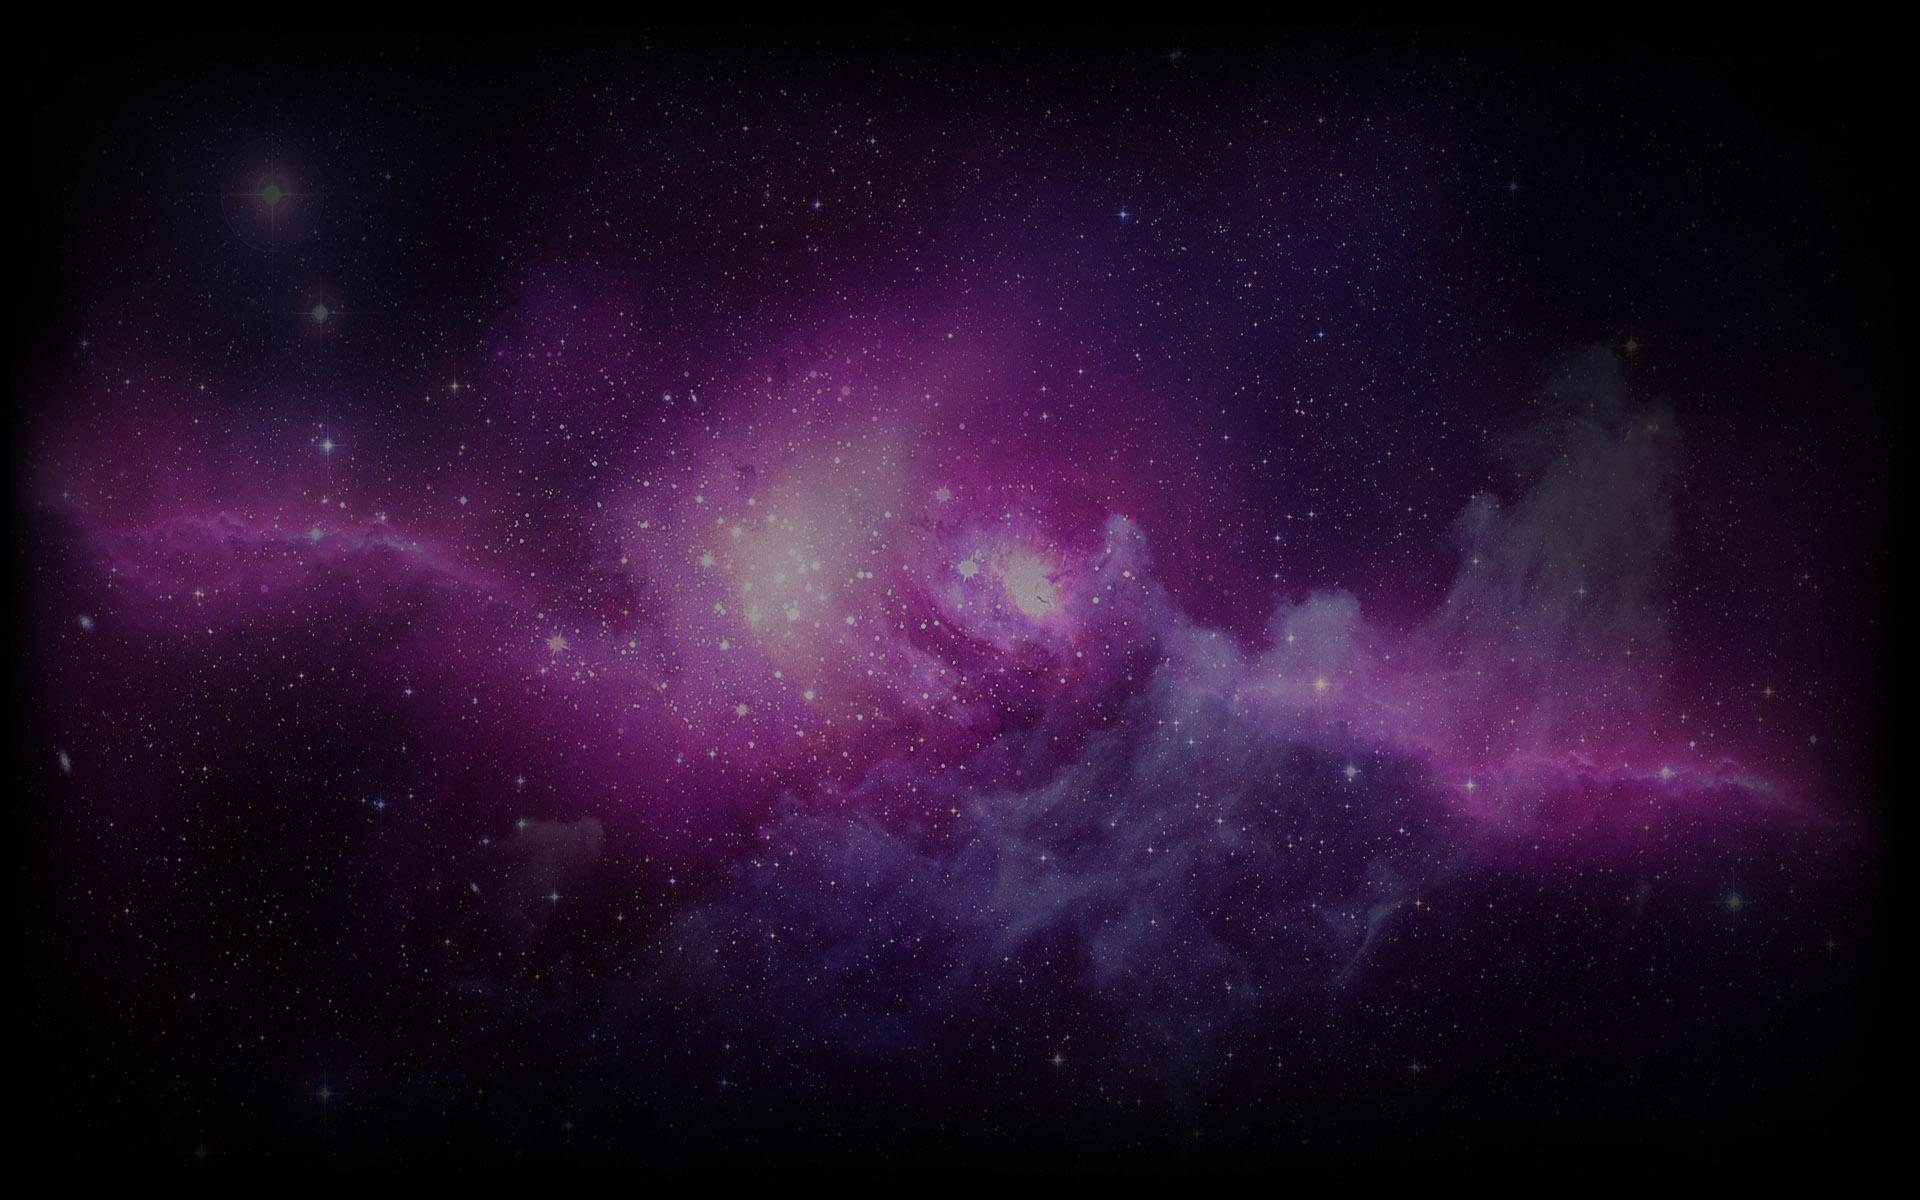 Mbc Purple Nebula - Purple Space Steam Background , HD Wallpaper & Backgrounds